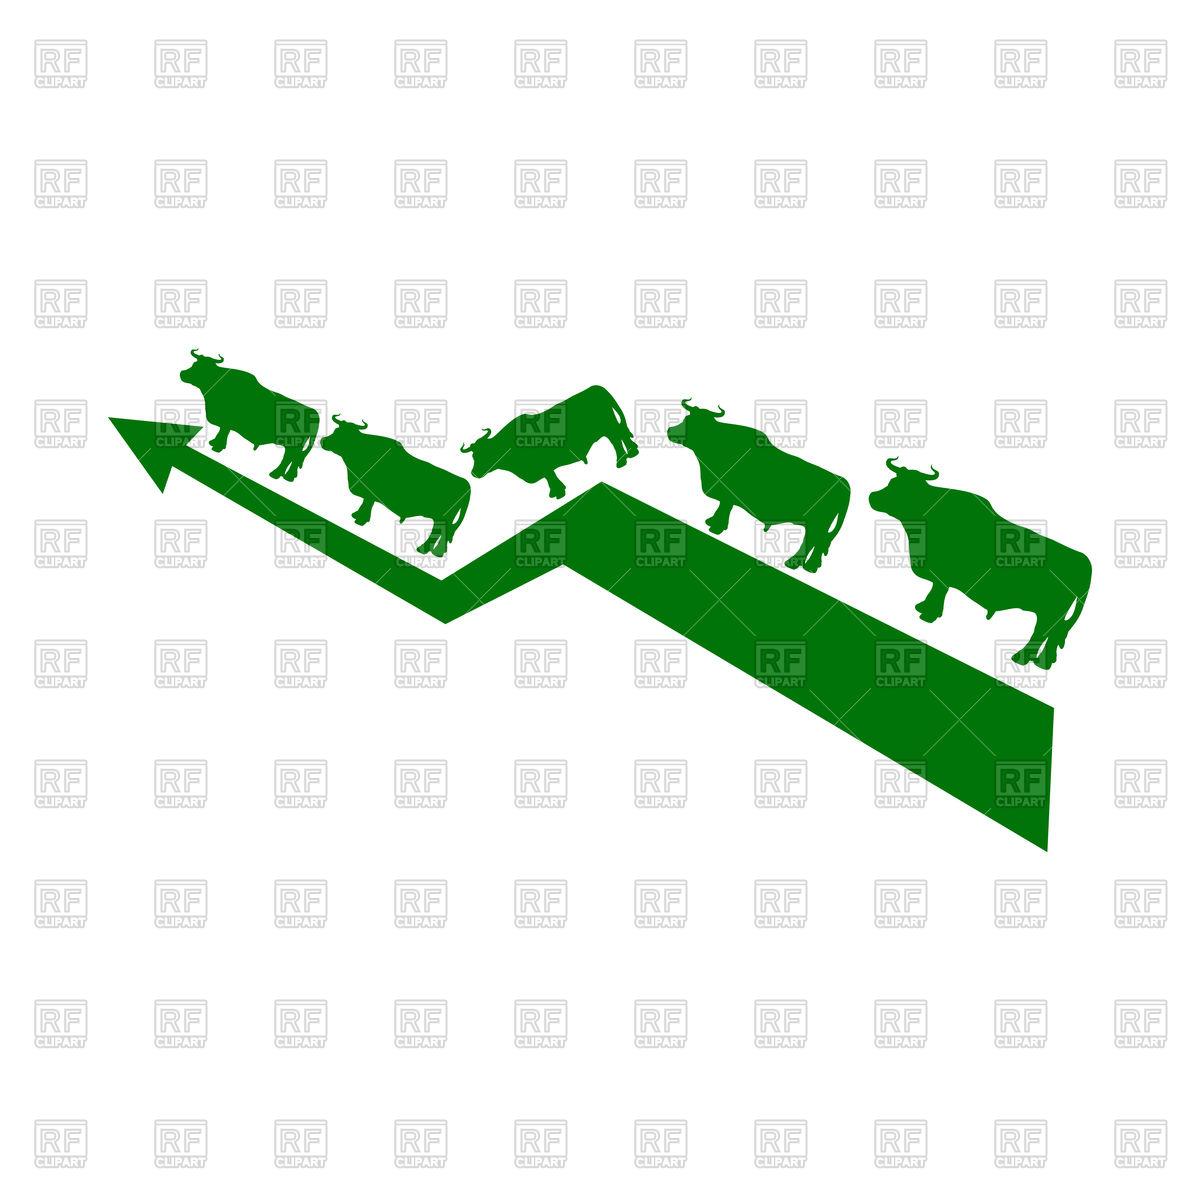 1200x1200 Green Bull Up Arrow. Exchange Trader. Business Concept Vector